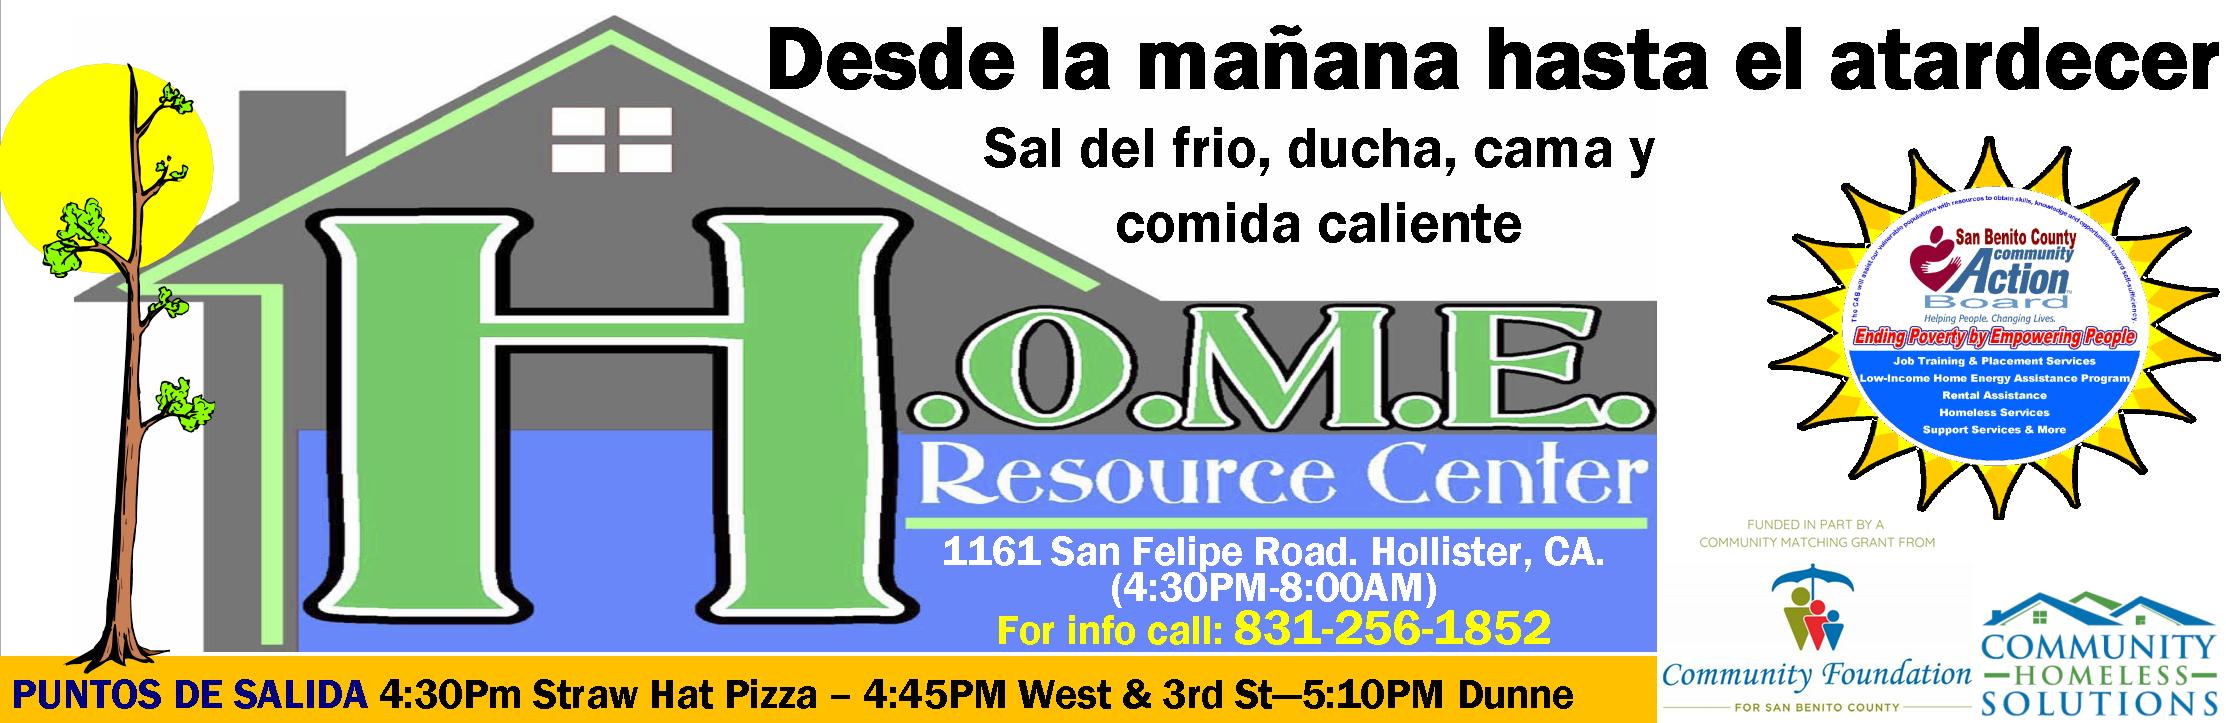 home resource center sp